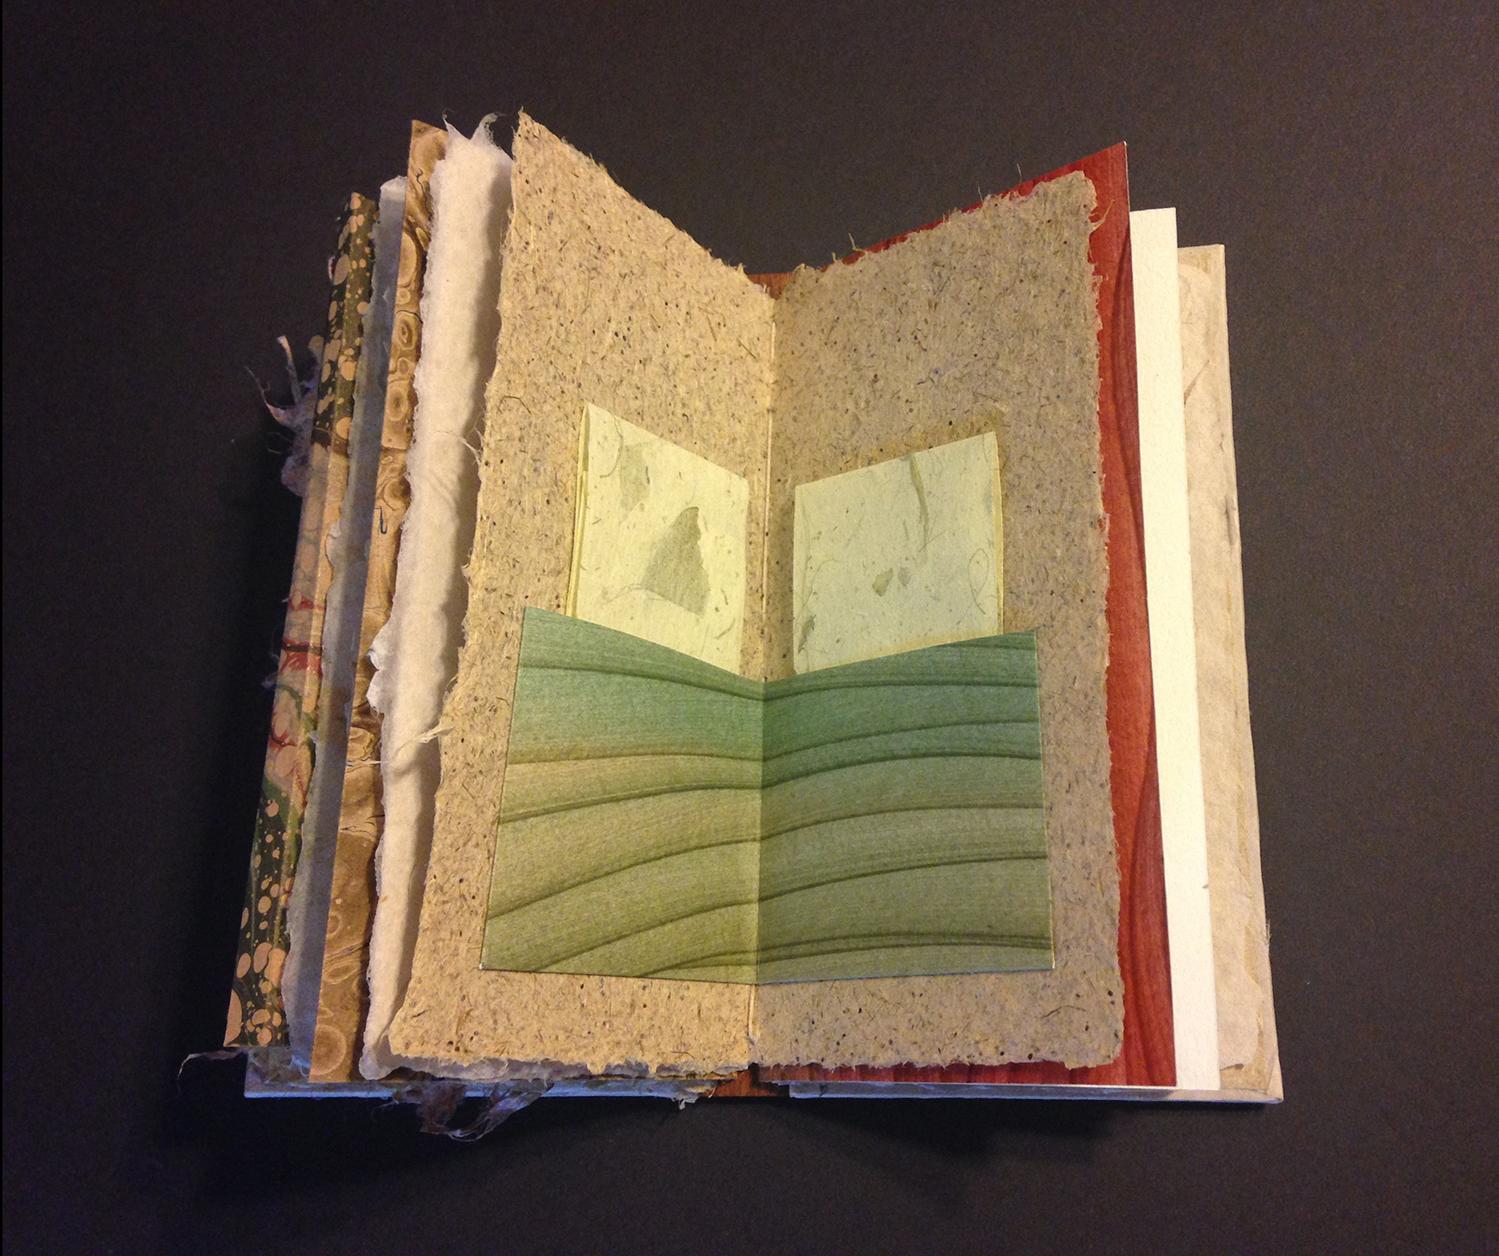 book image 1.png